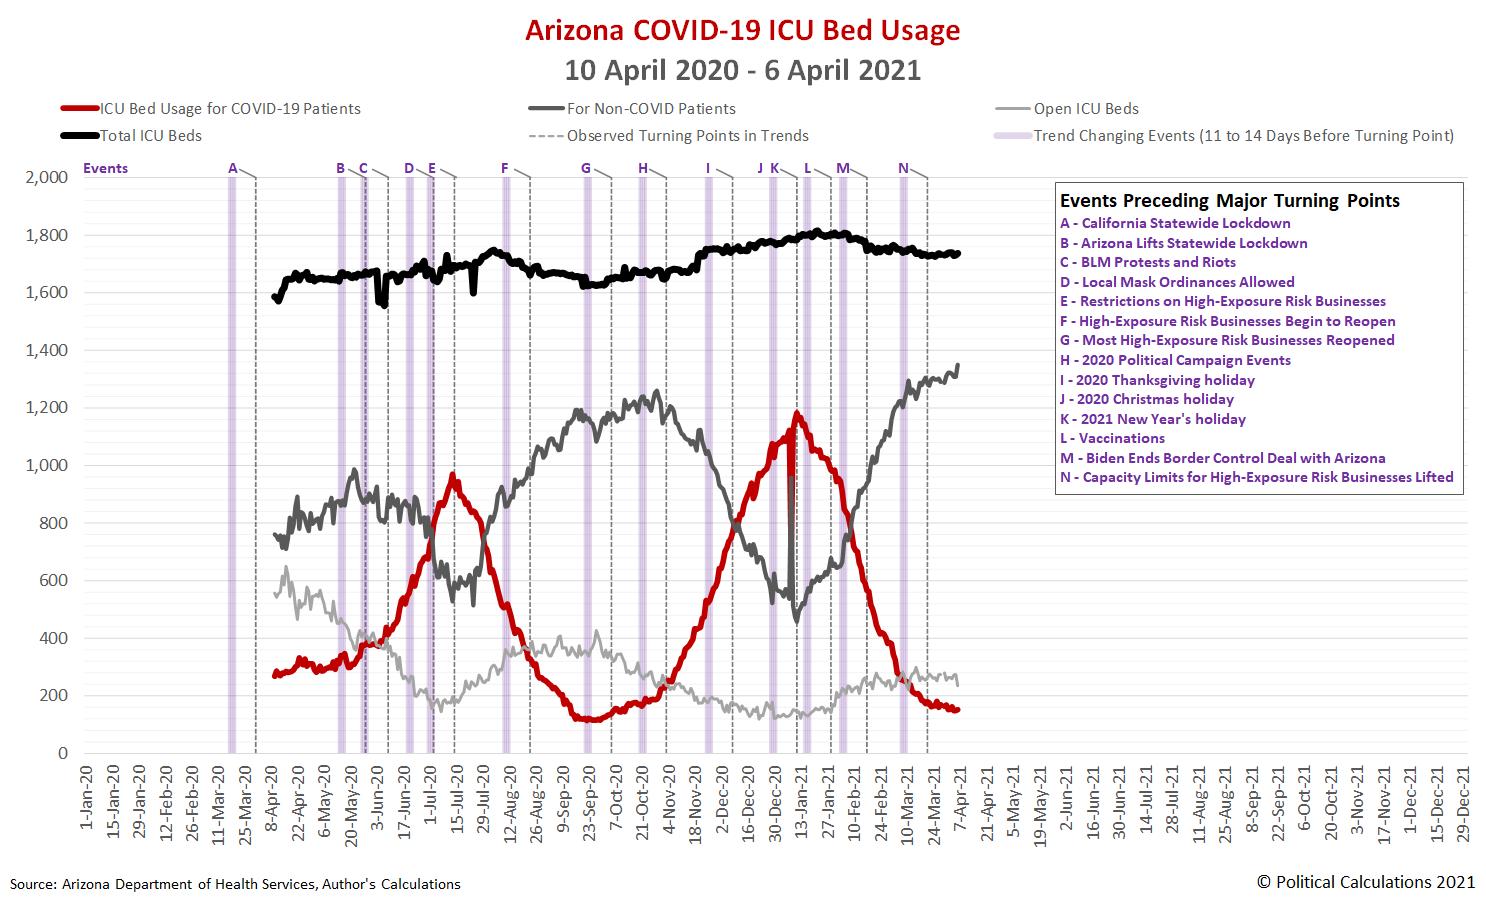 Arizona COVID-19 ICU Bed Usage, 10 April 2020 - 6 April 2021